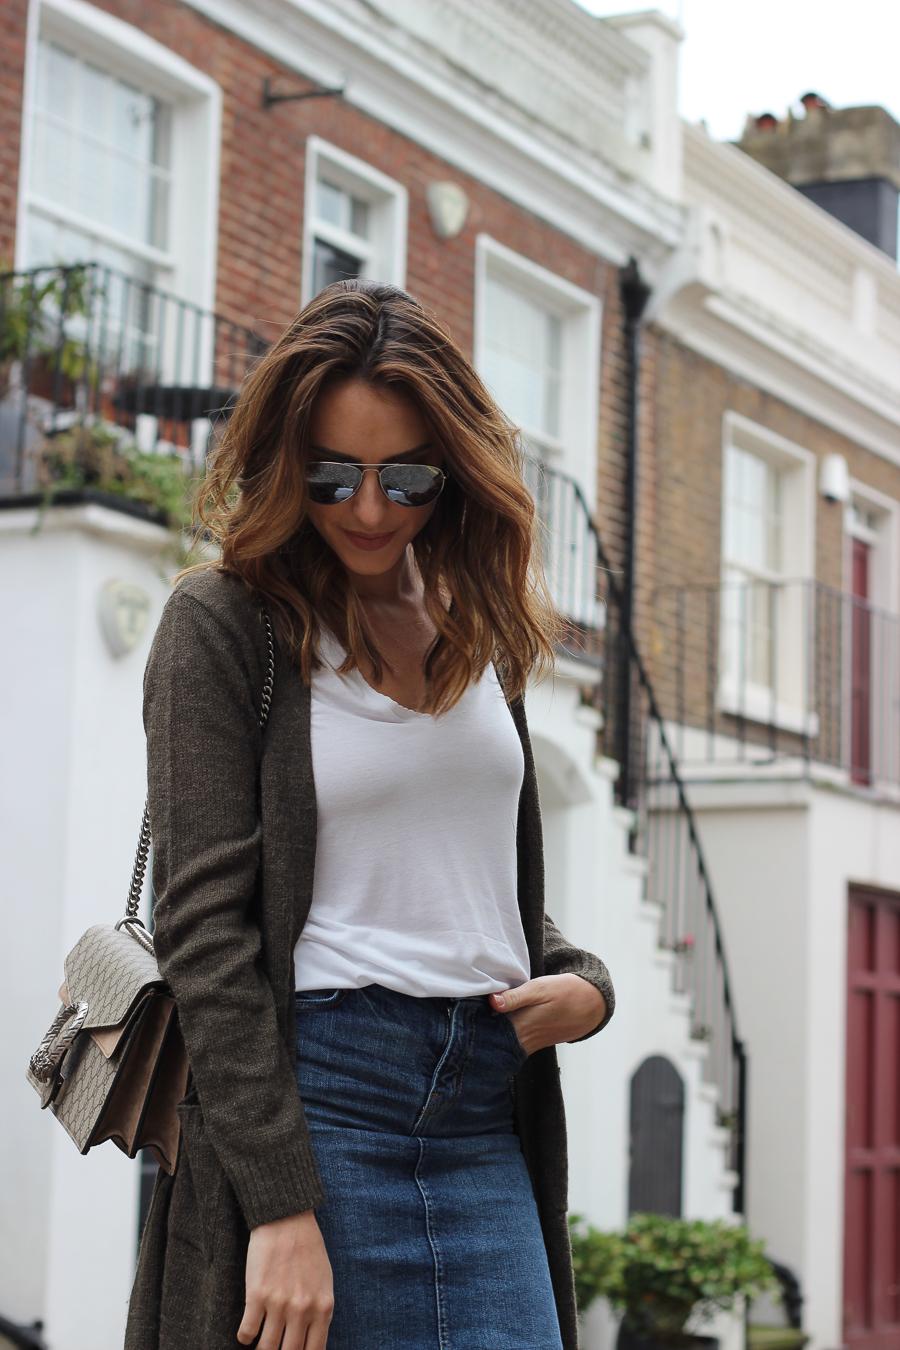 Clutch and carry on - uk fashion blogger - uk travel blogger - sabrina chakici - matalan cardigan, zara denim midi skirt, gucci dionysus supreme-3